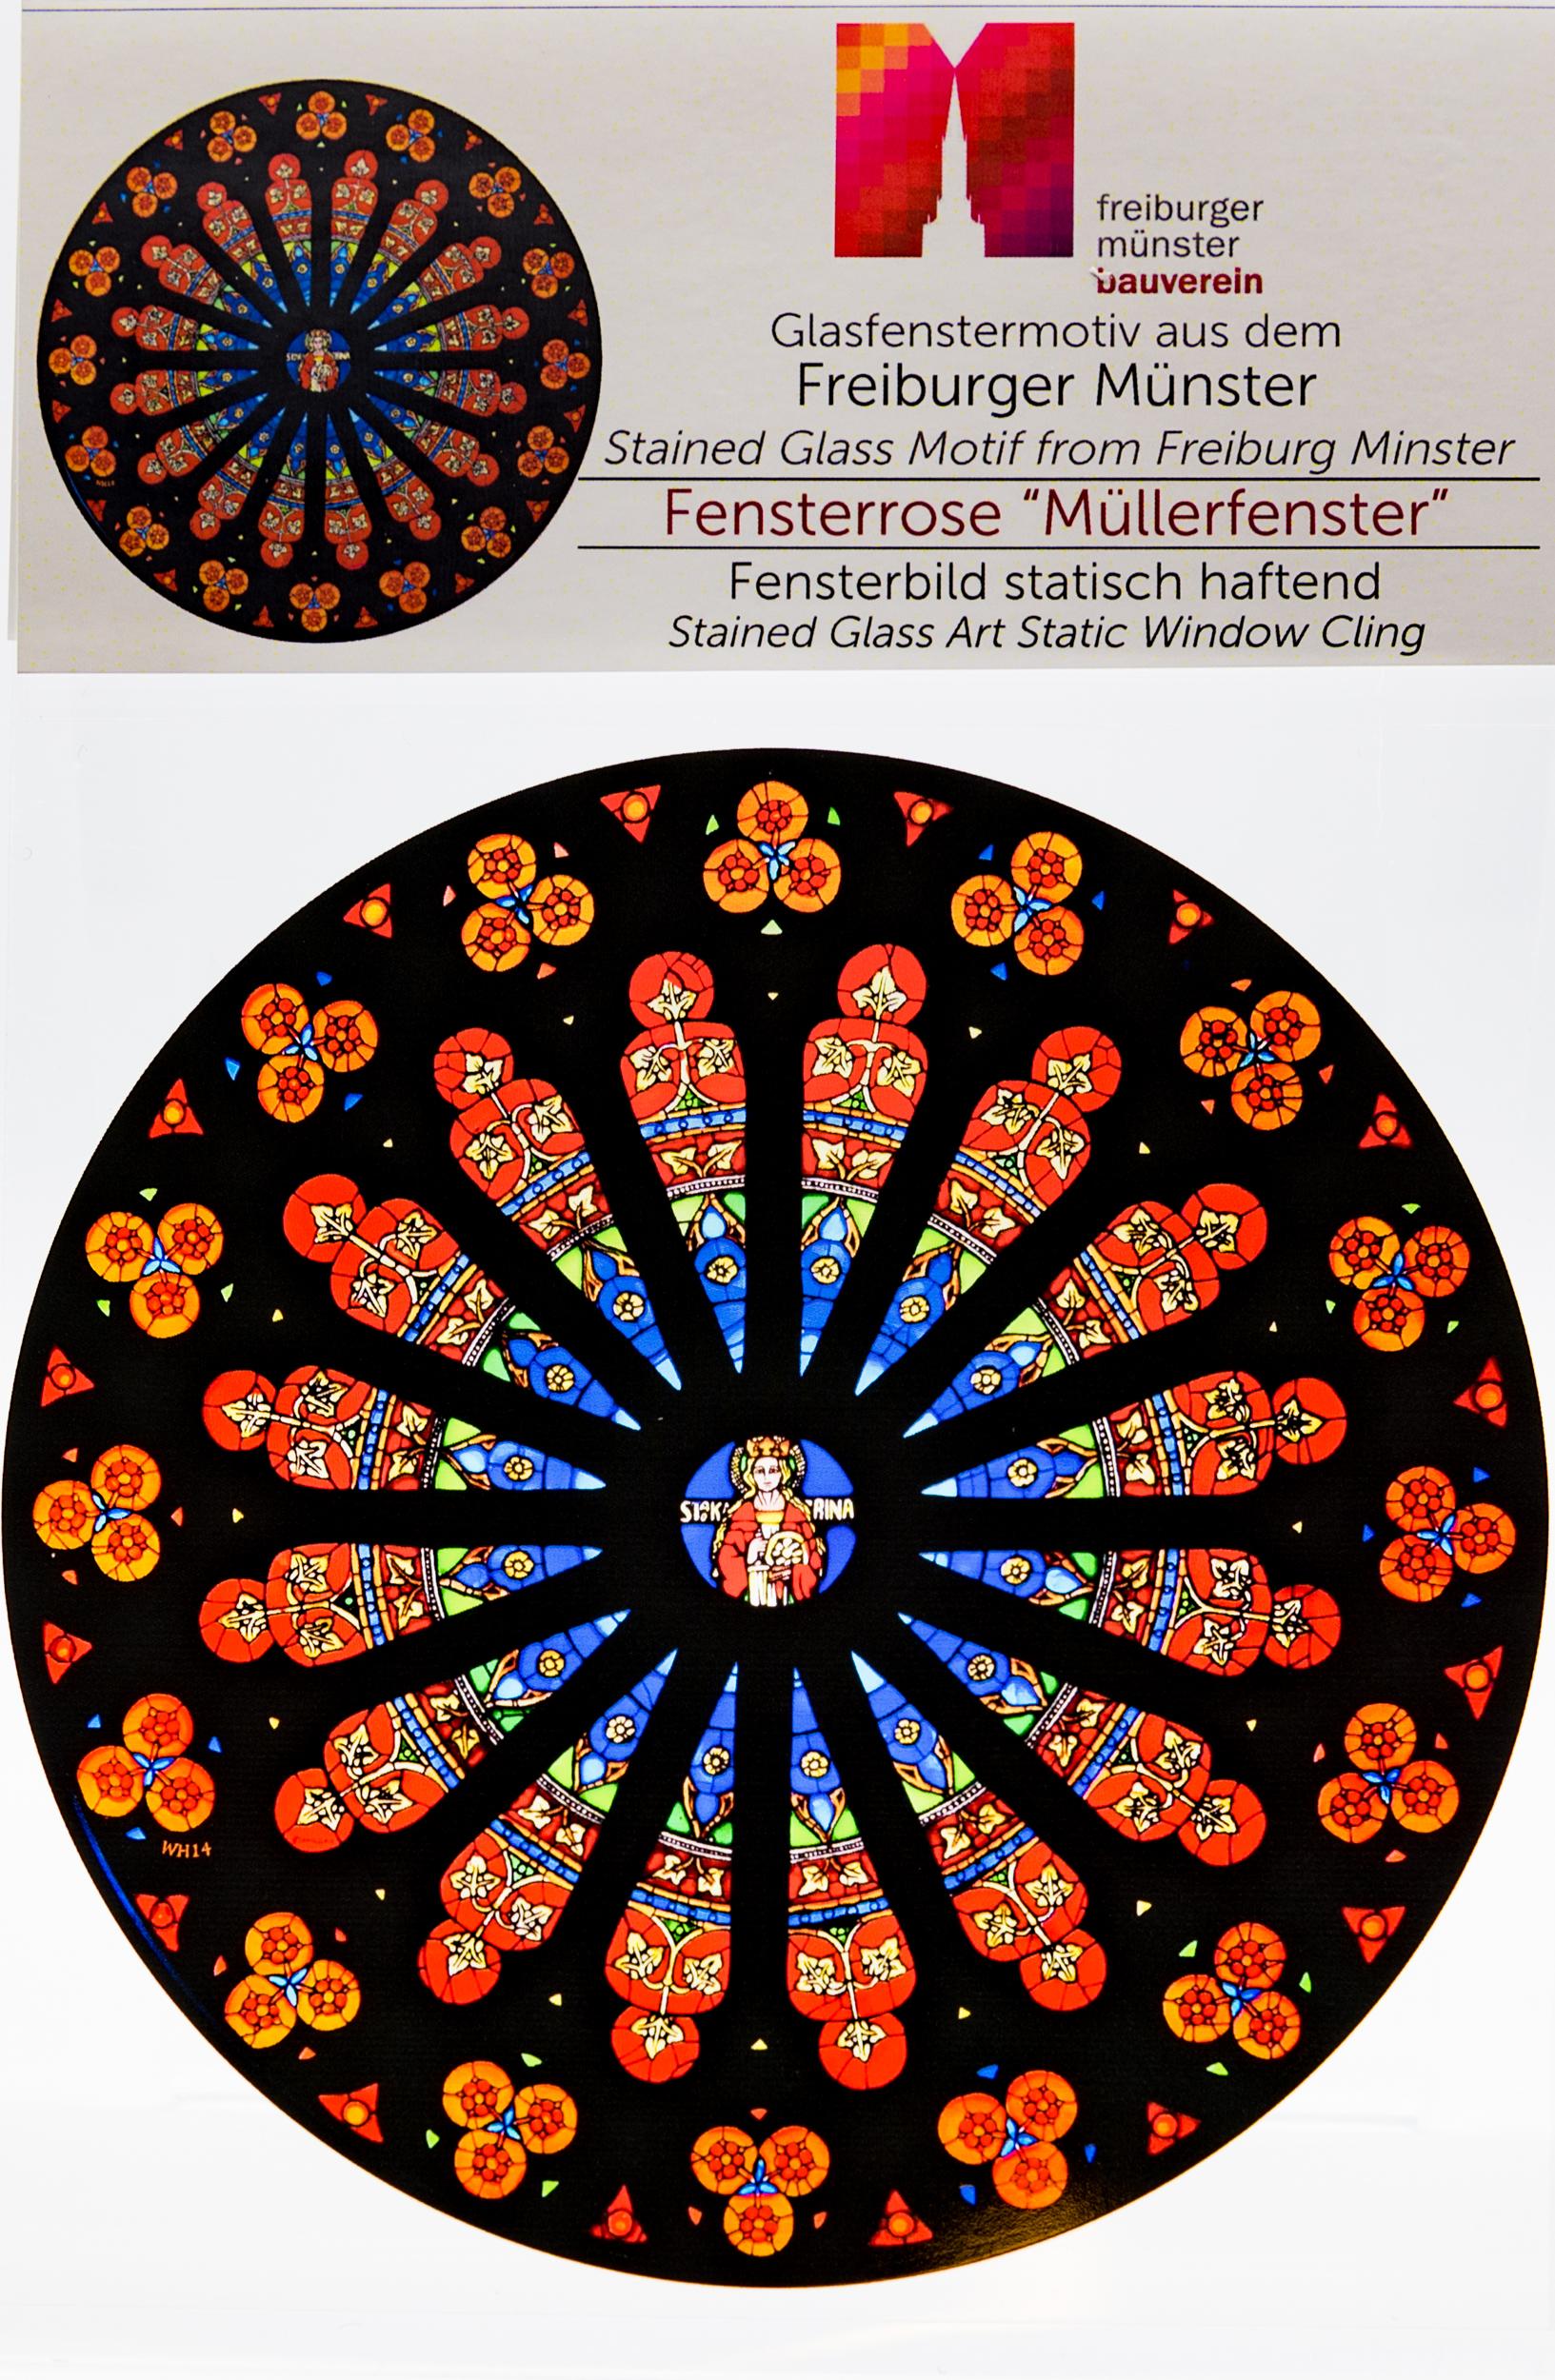 Münsterladen Freiburg Glasmalerei Fensterfolie Rosette